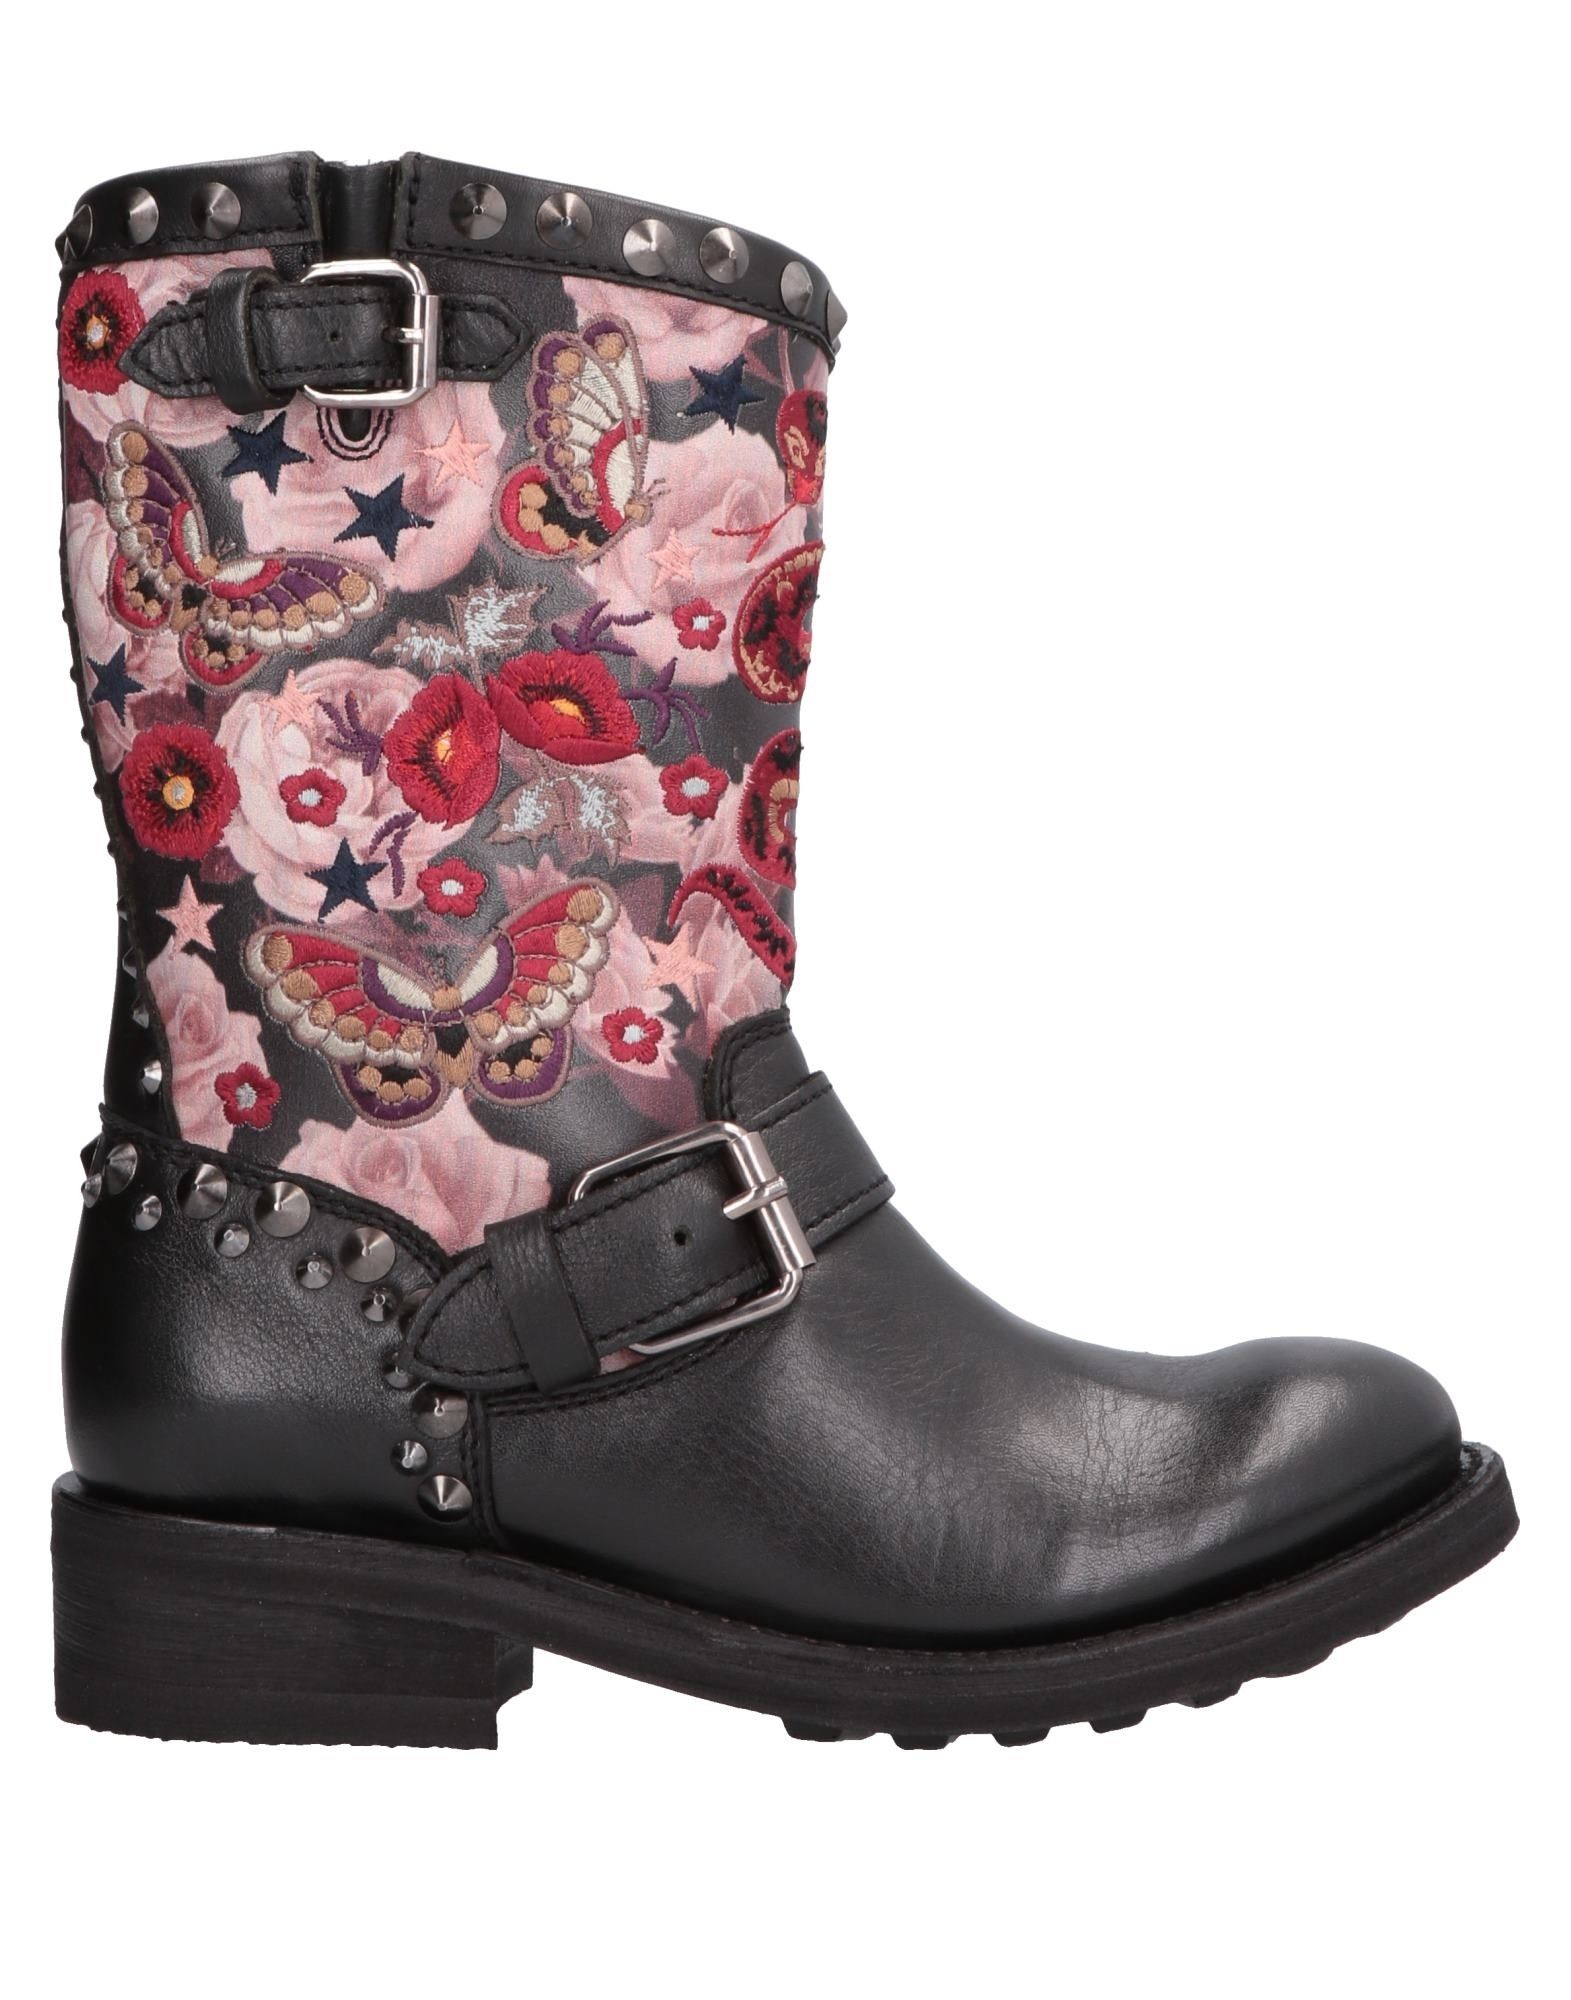 Ash Ankle Boot - Women Women - Ash Ankle Boots online on  United Kingdom - 11570361IJ d3e772